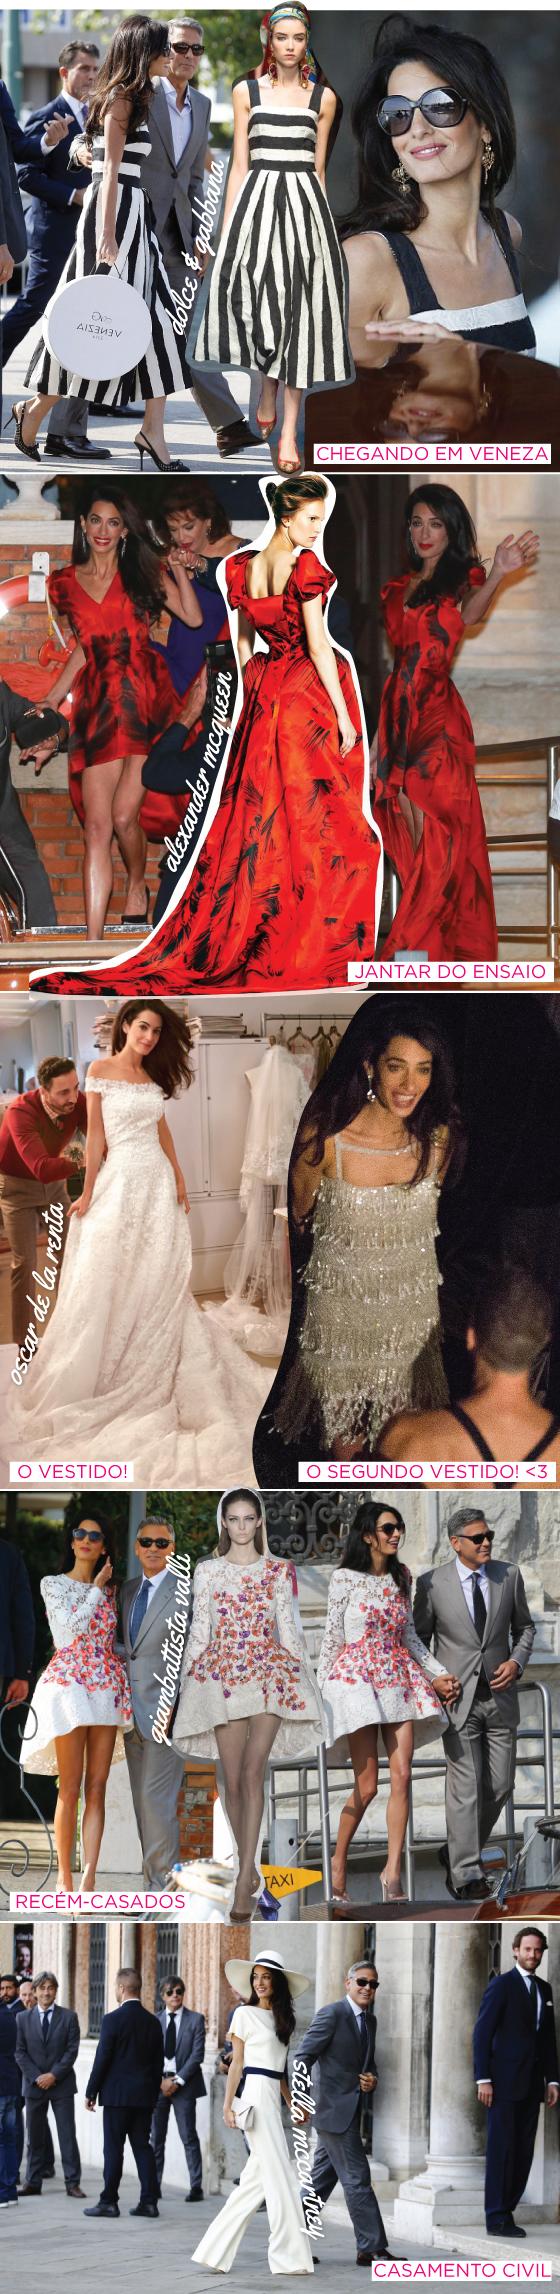 amal-alamuddin-casamento-george-clooney-vestido-oscar-de-la-renta-wedding-dress-details-looks-veneza-venice